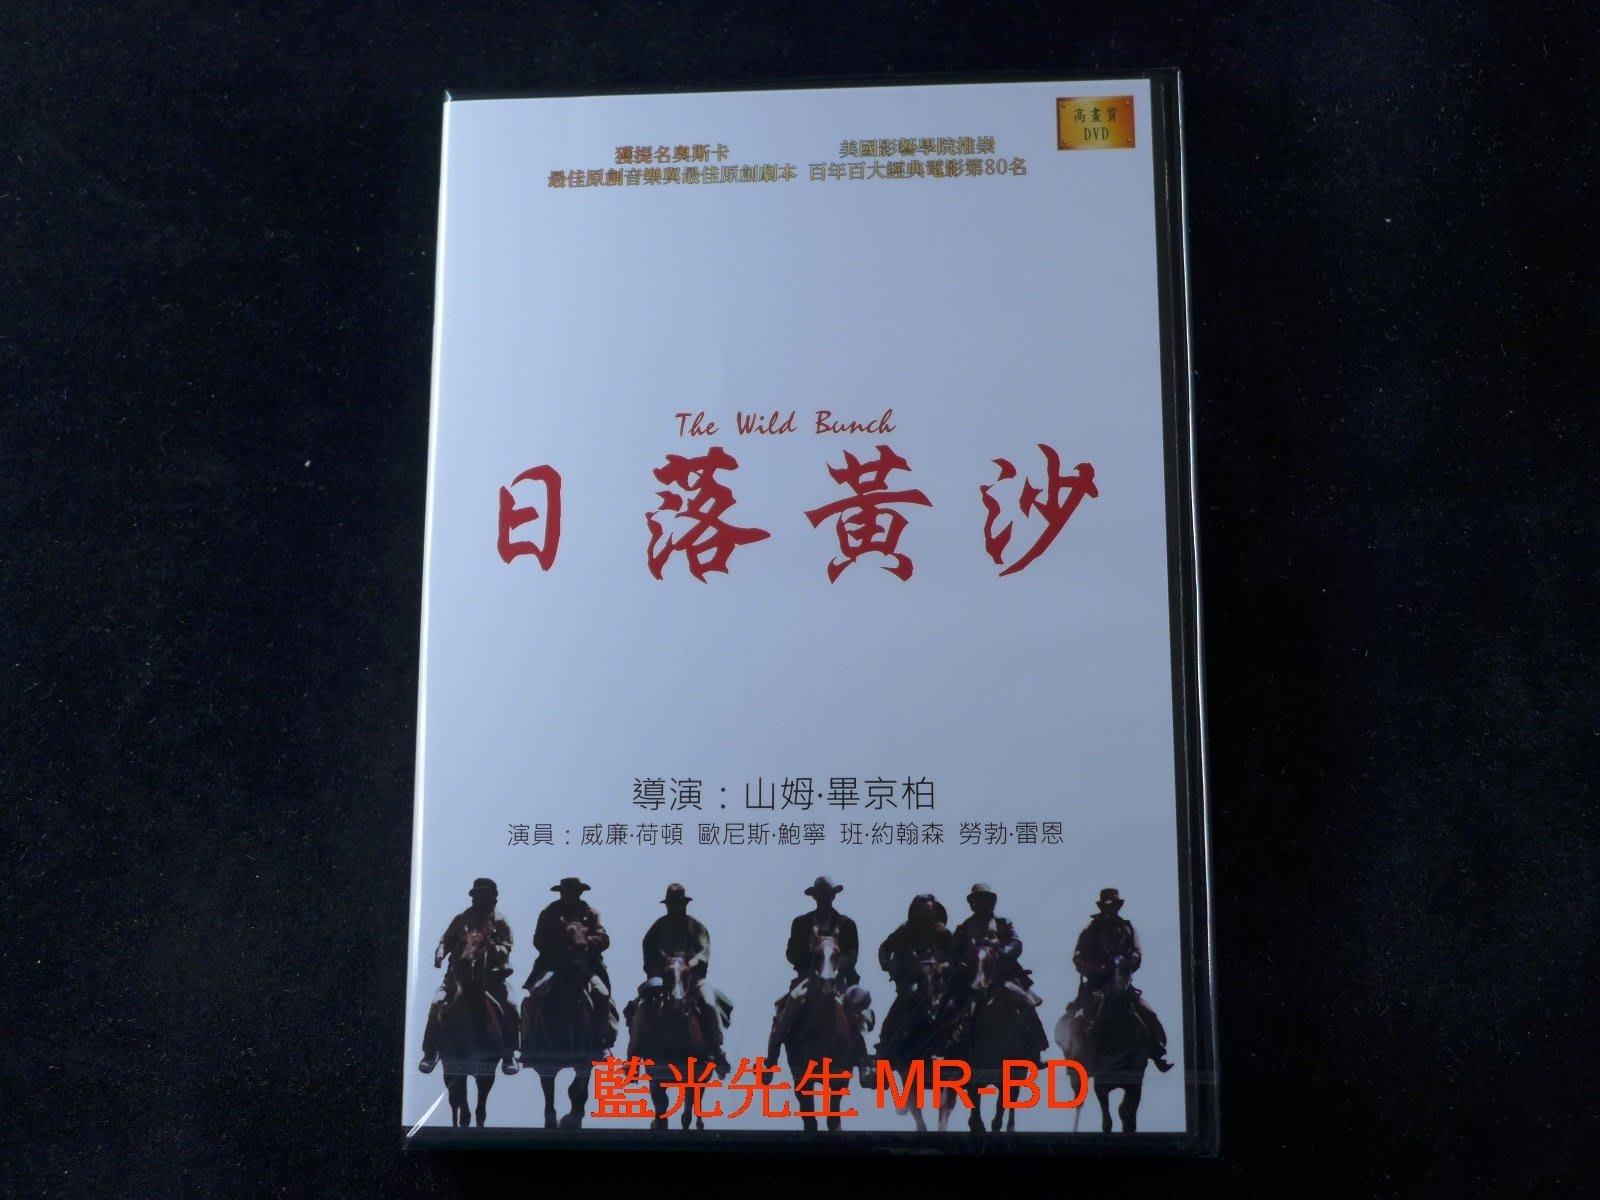 [DVD] - 日落黃沙 The Wild Bunch ( 新動正版 )